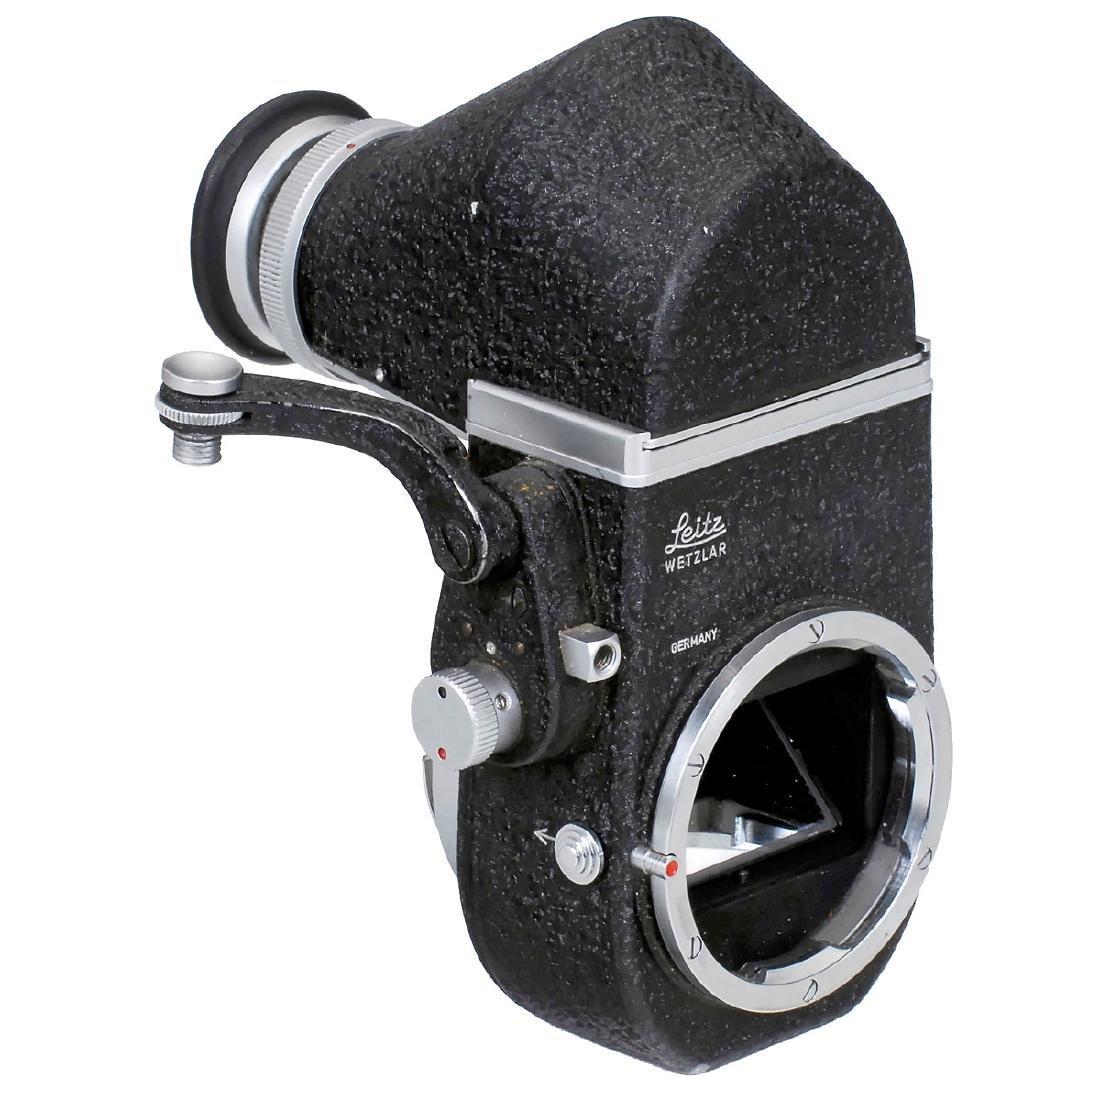 Summicron 2/90 mm, 1970 - 3